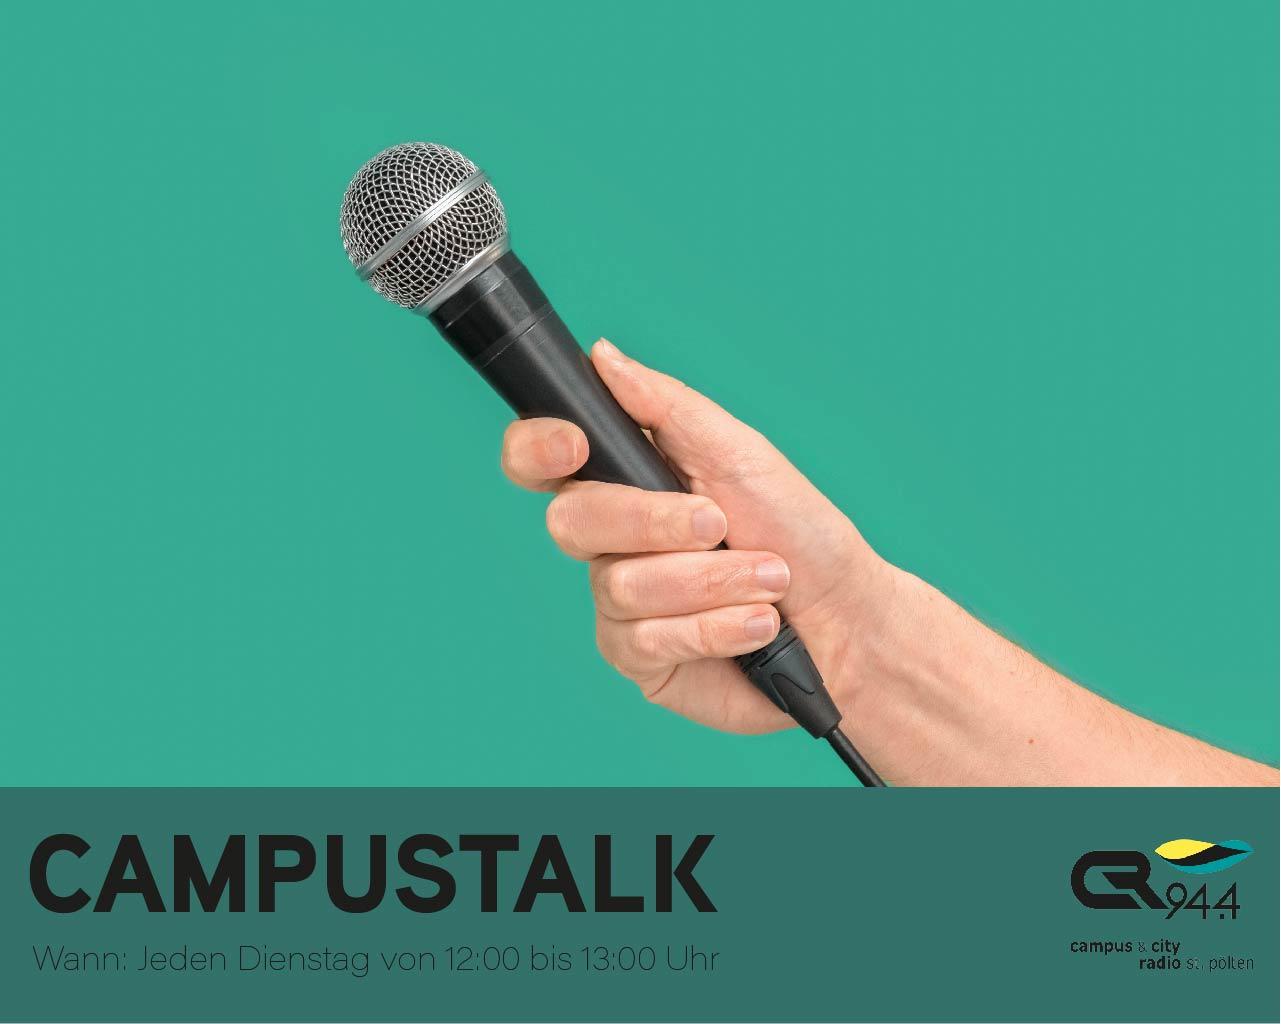 Campustalk zum Coding Contest und Creative Computing, Di. 31.3. 12-13h